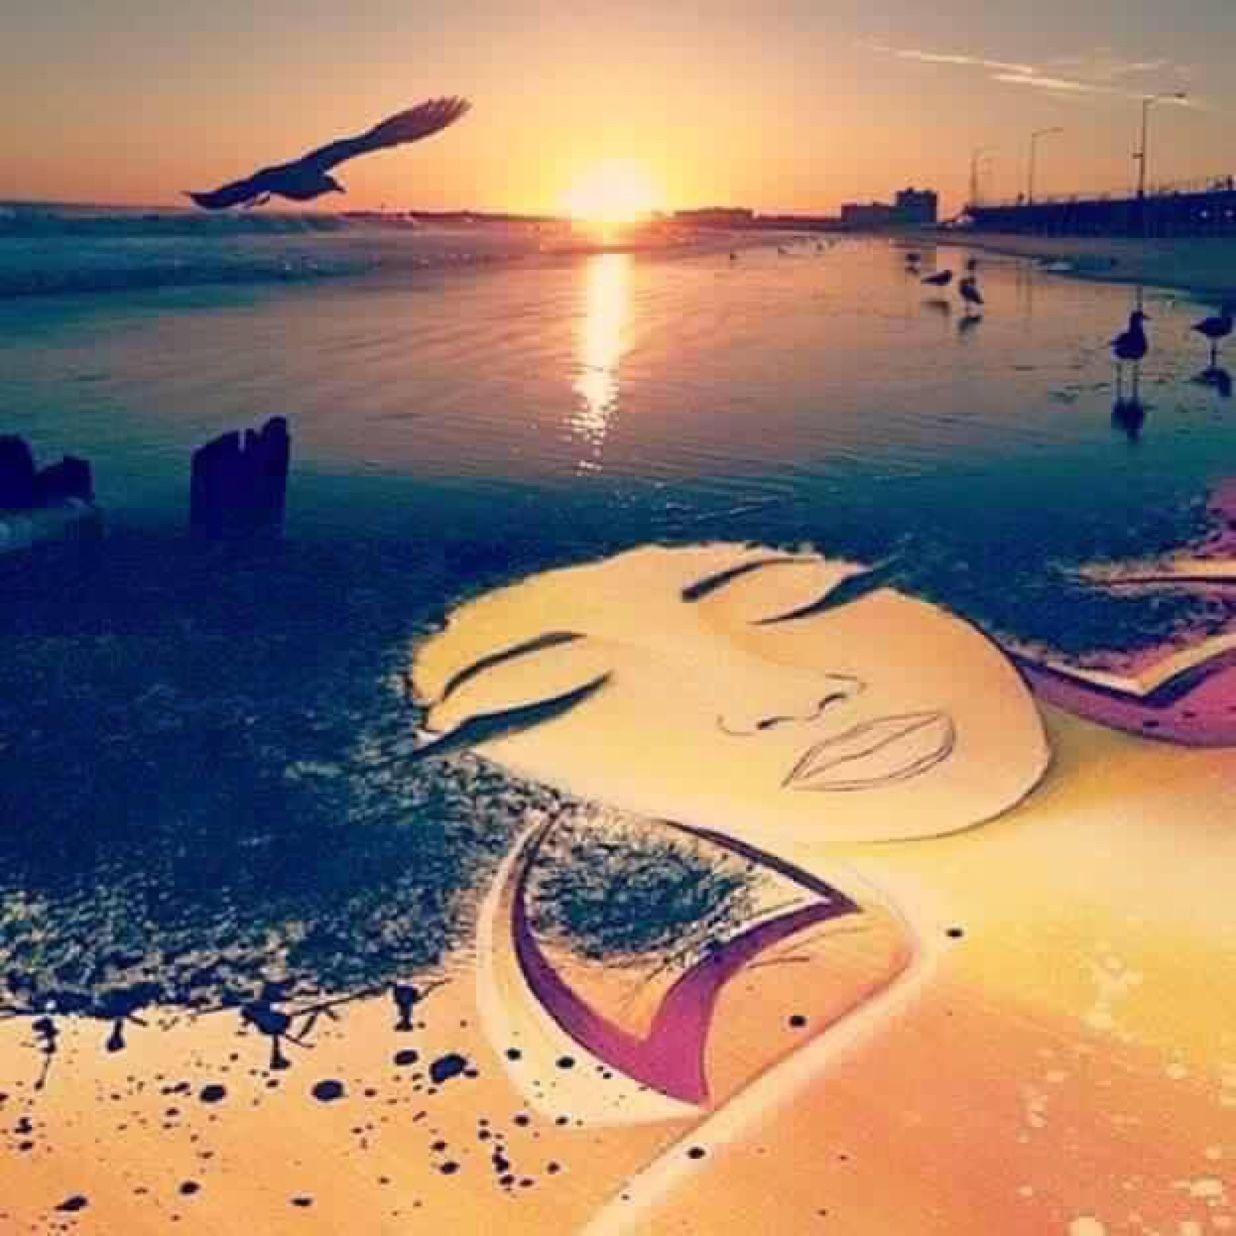 sunrise beach single christian girls Cdff (christian dating for free) largest sunrise-beach, missouri christian singles dating app/site 100% free to meet birmingham christian singles near you today.